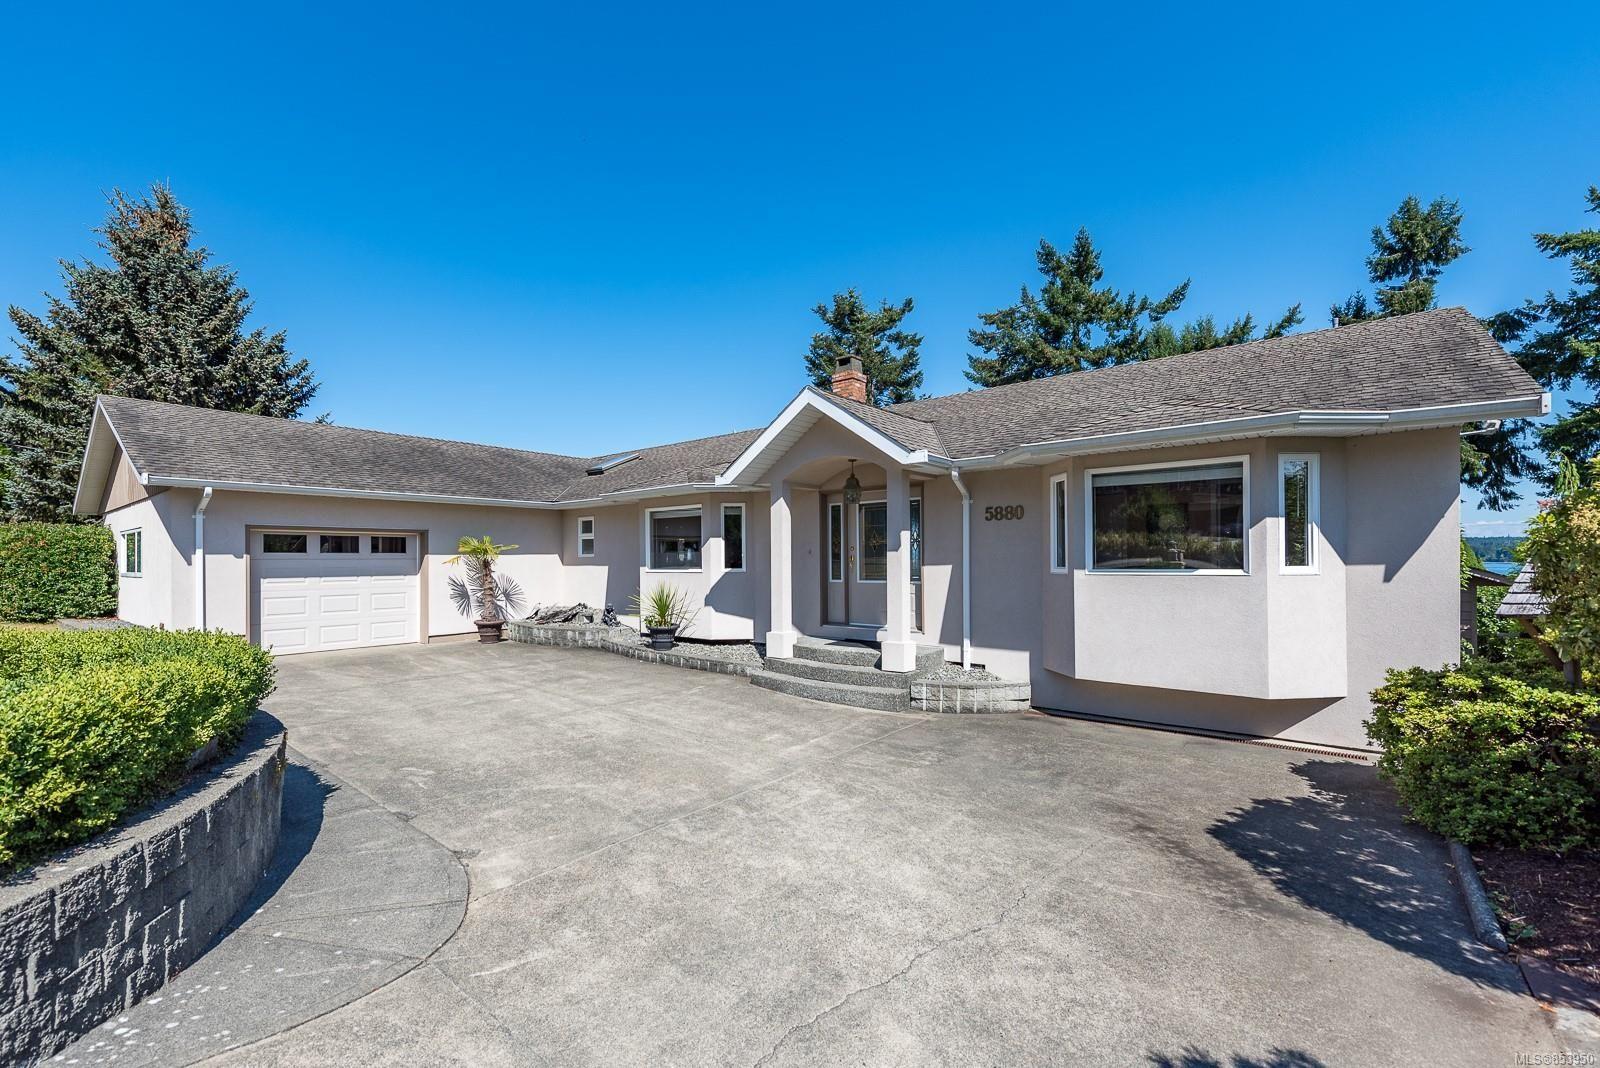 Photo 2: Photos: 5880 GARVIN Rd in : CV Union Bay/Fanny Bay House for sale (Comox Valley)  : MLS®# 853950